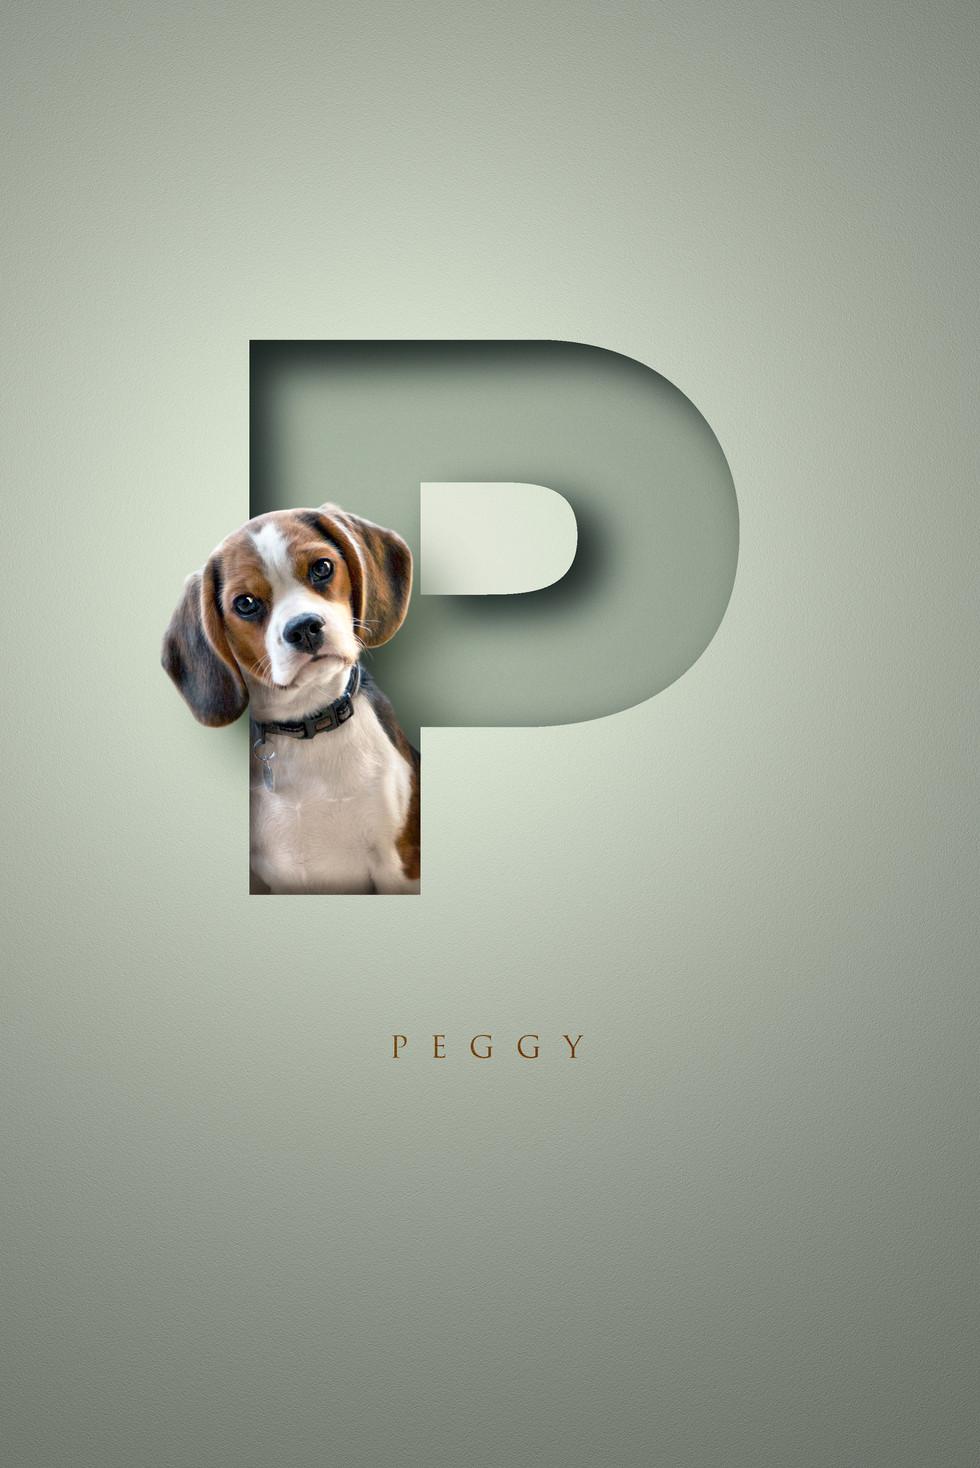 Peggy 12x8.jpg